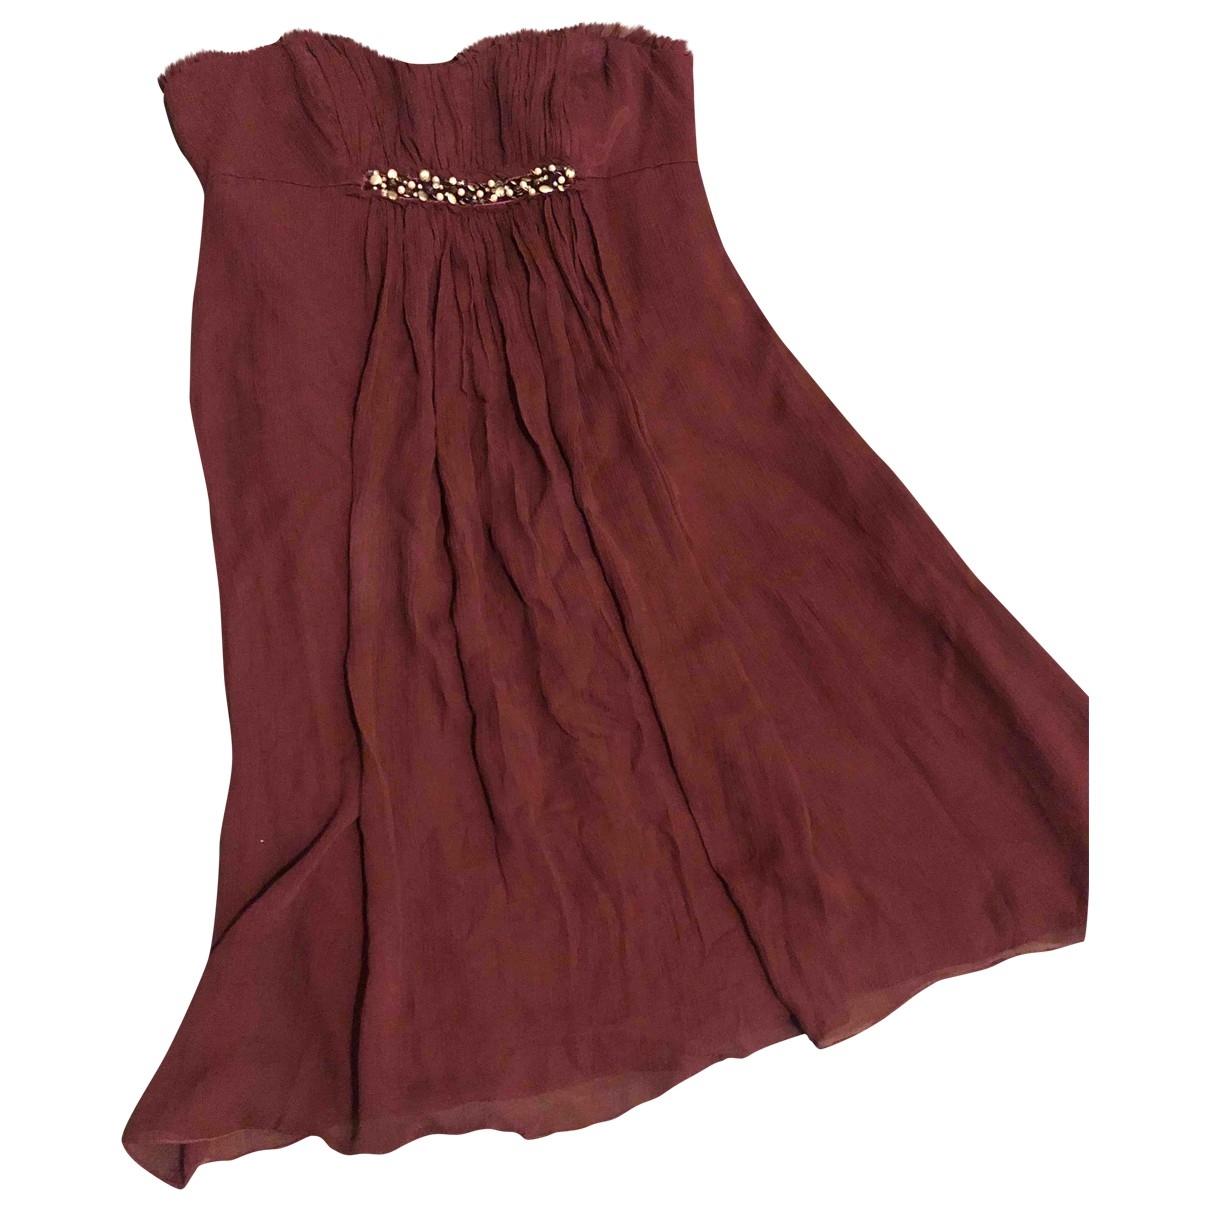 Bcbg Max Azria \N Purple Silk dress for Women 4 0-5